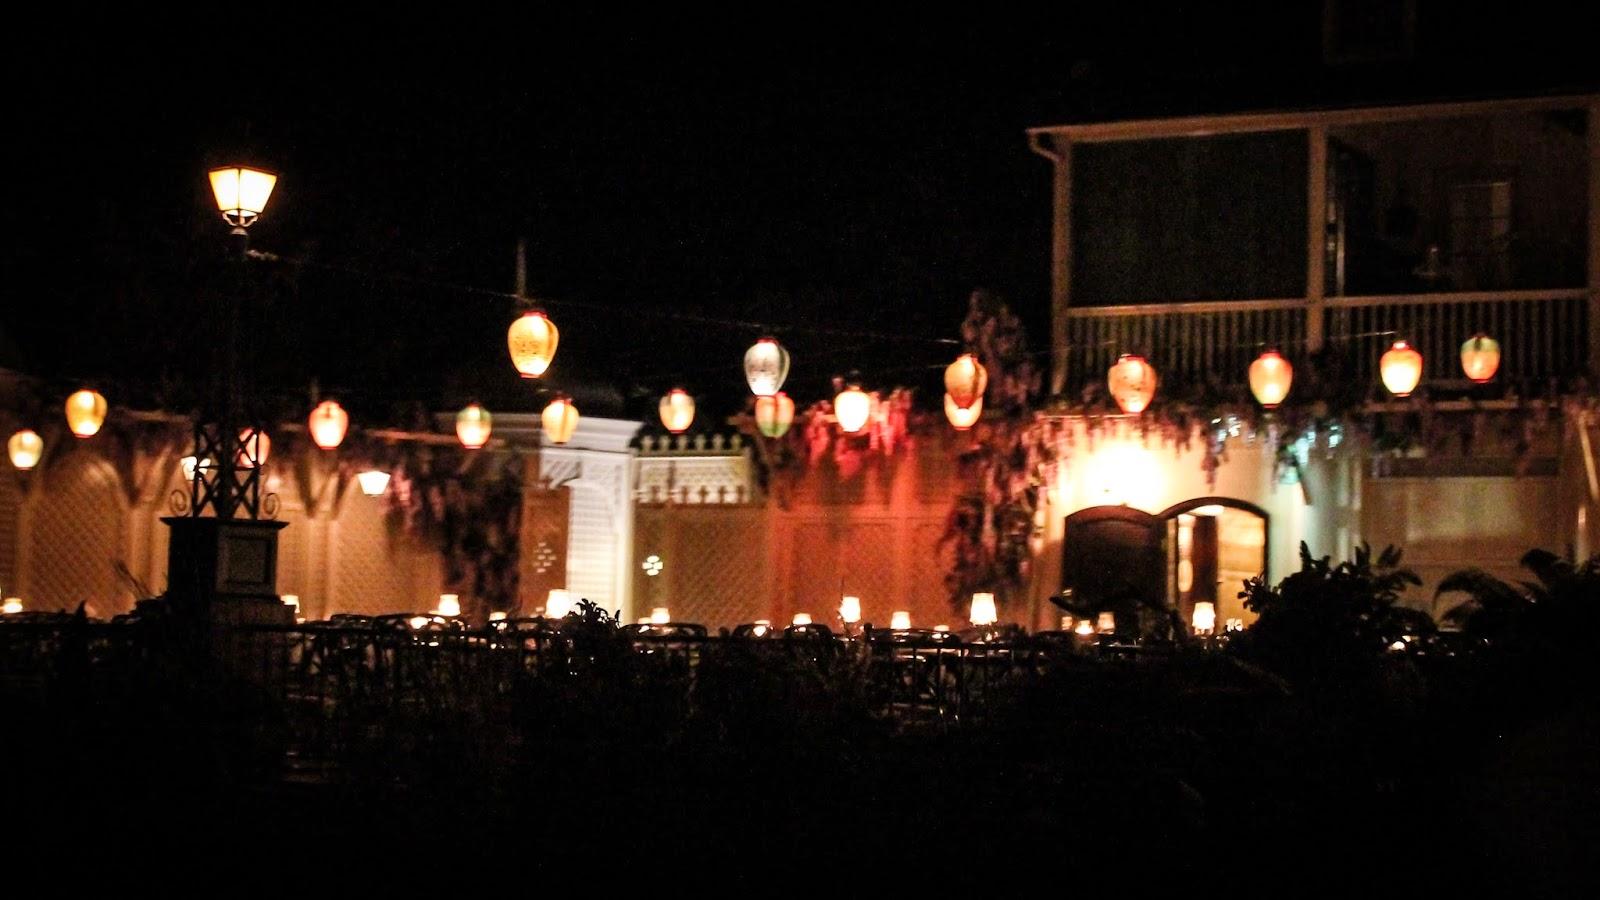 23 Disneyland Tips including getting reservations just days in advance. LoveOurDisney.com